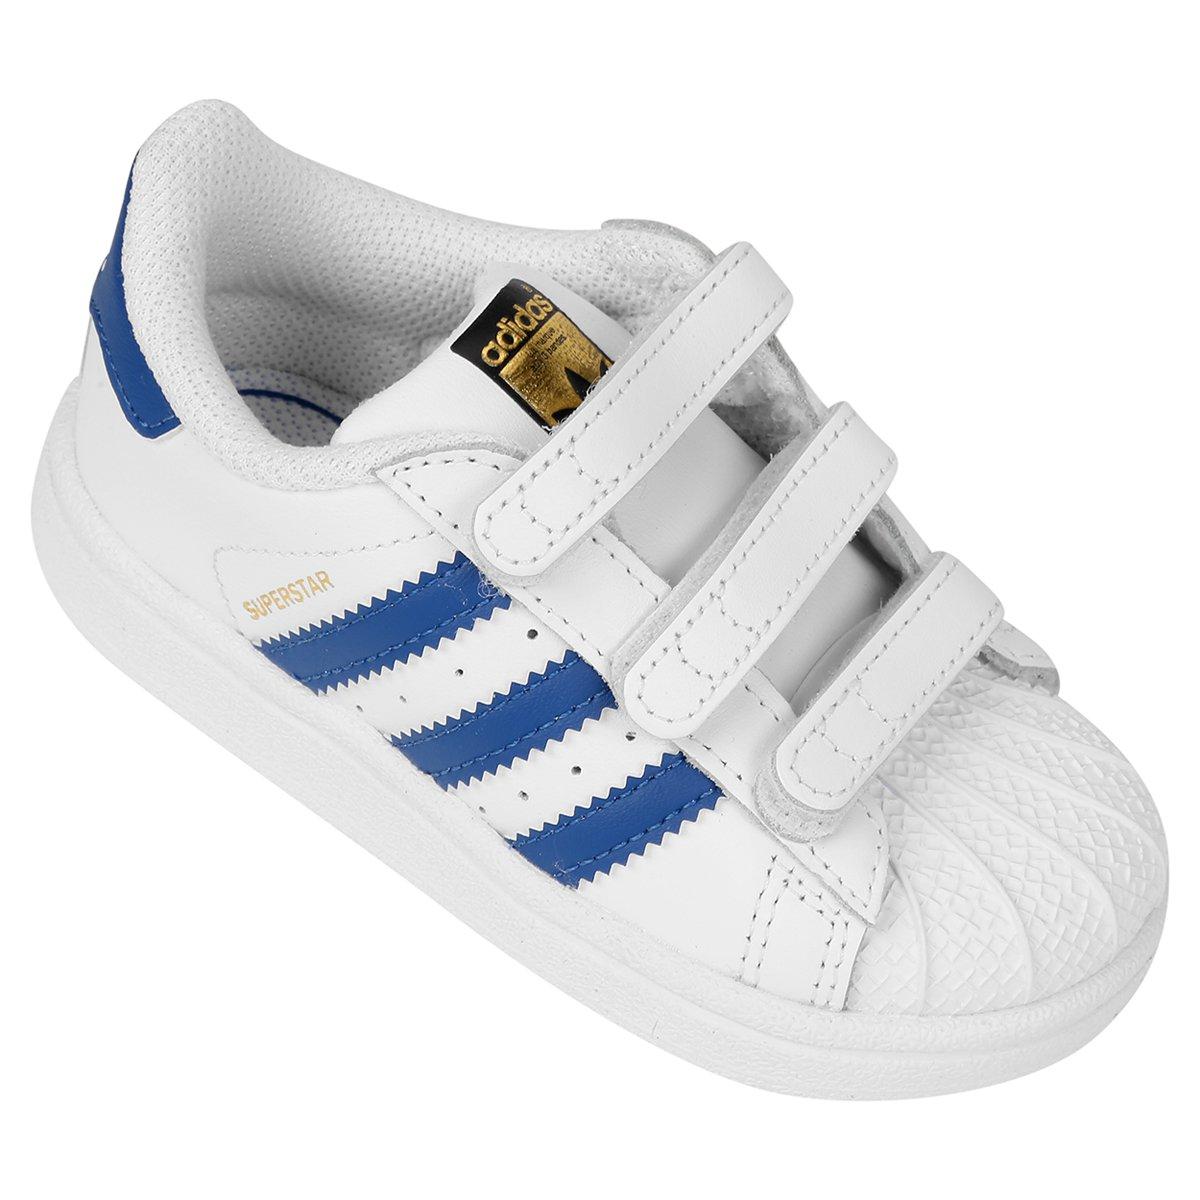 d8ddd11fbfe Tênis Adidas Superstar Foundation Cf Infantil - Compre Agora